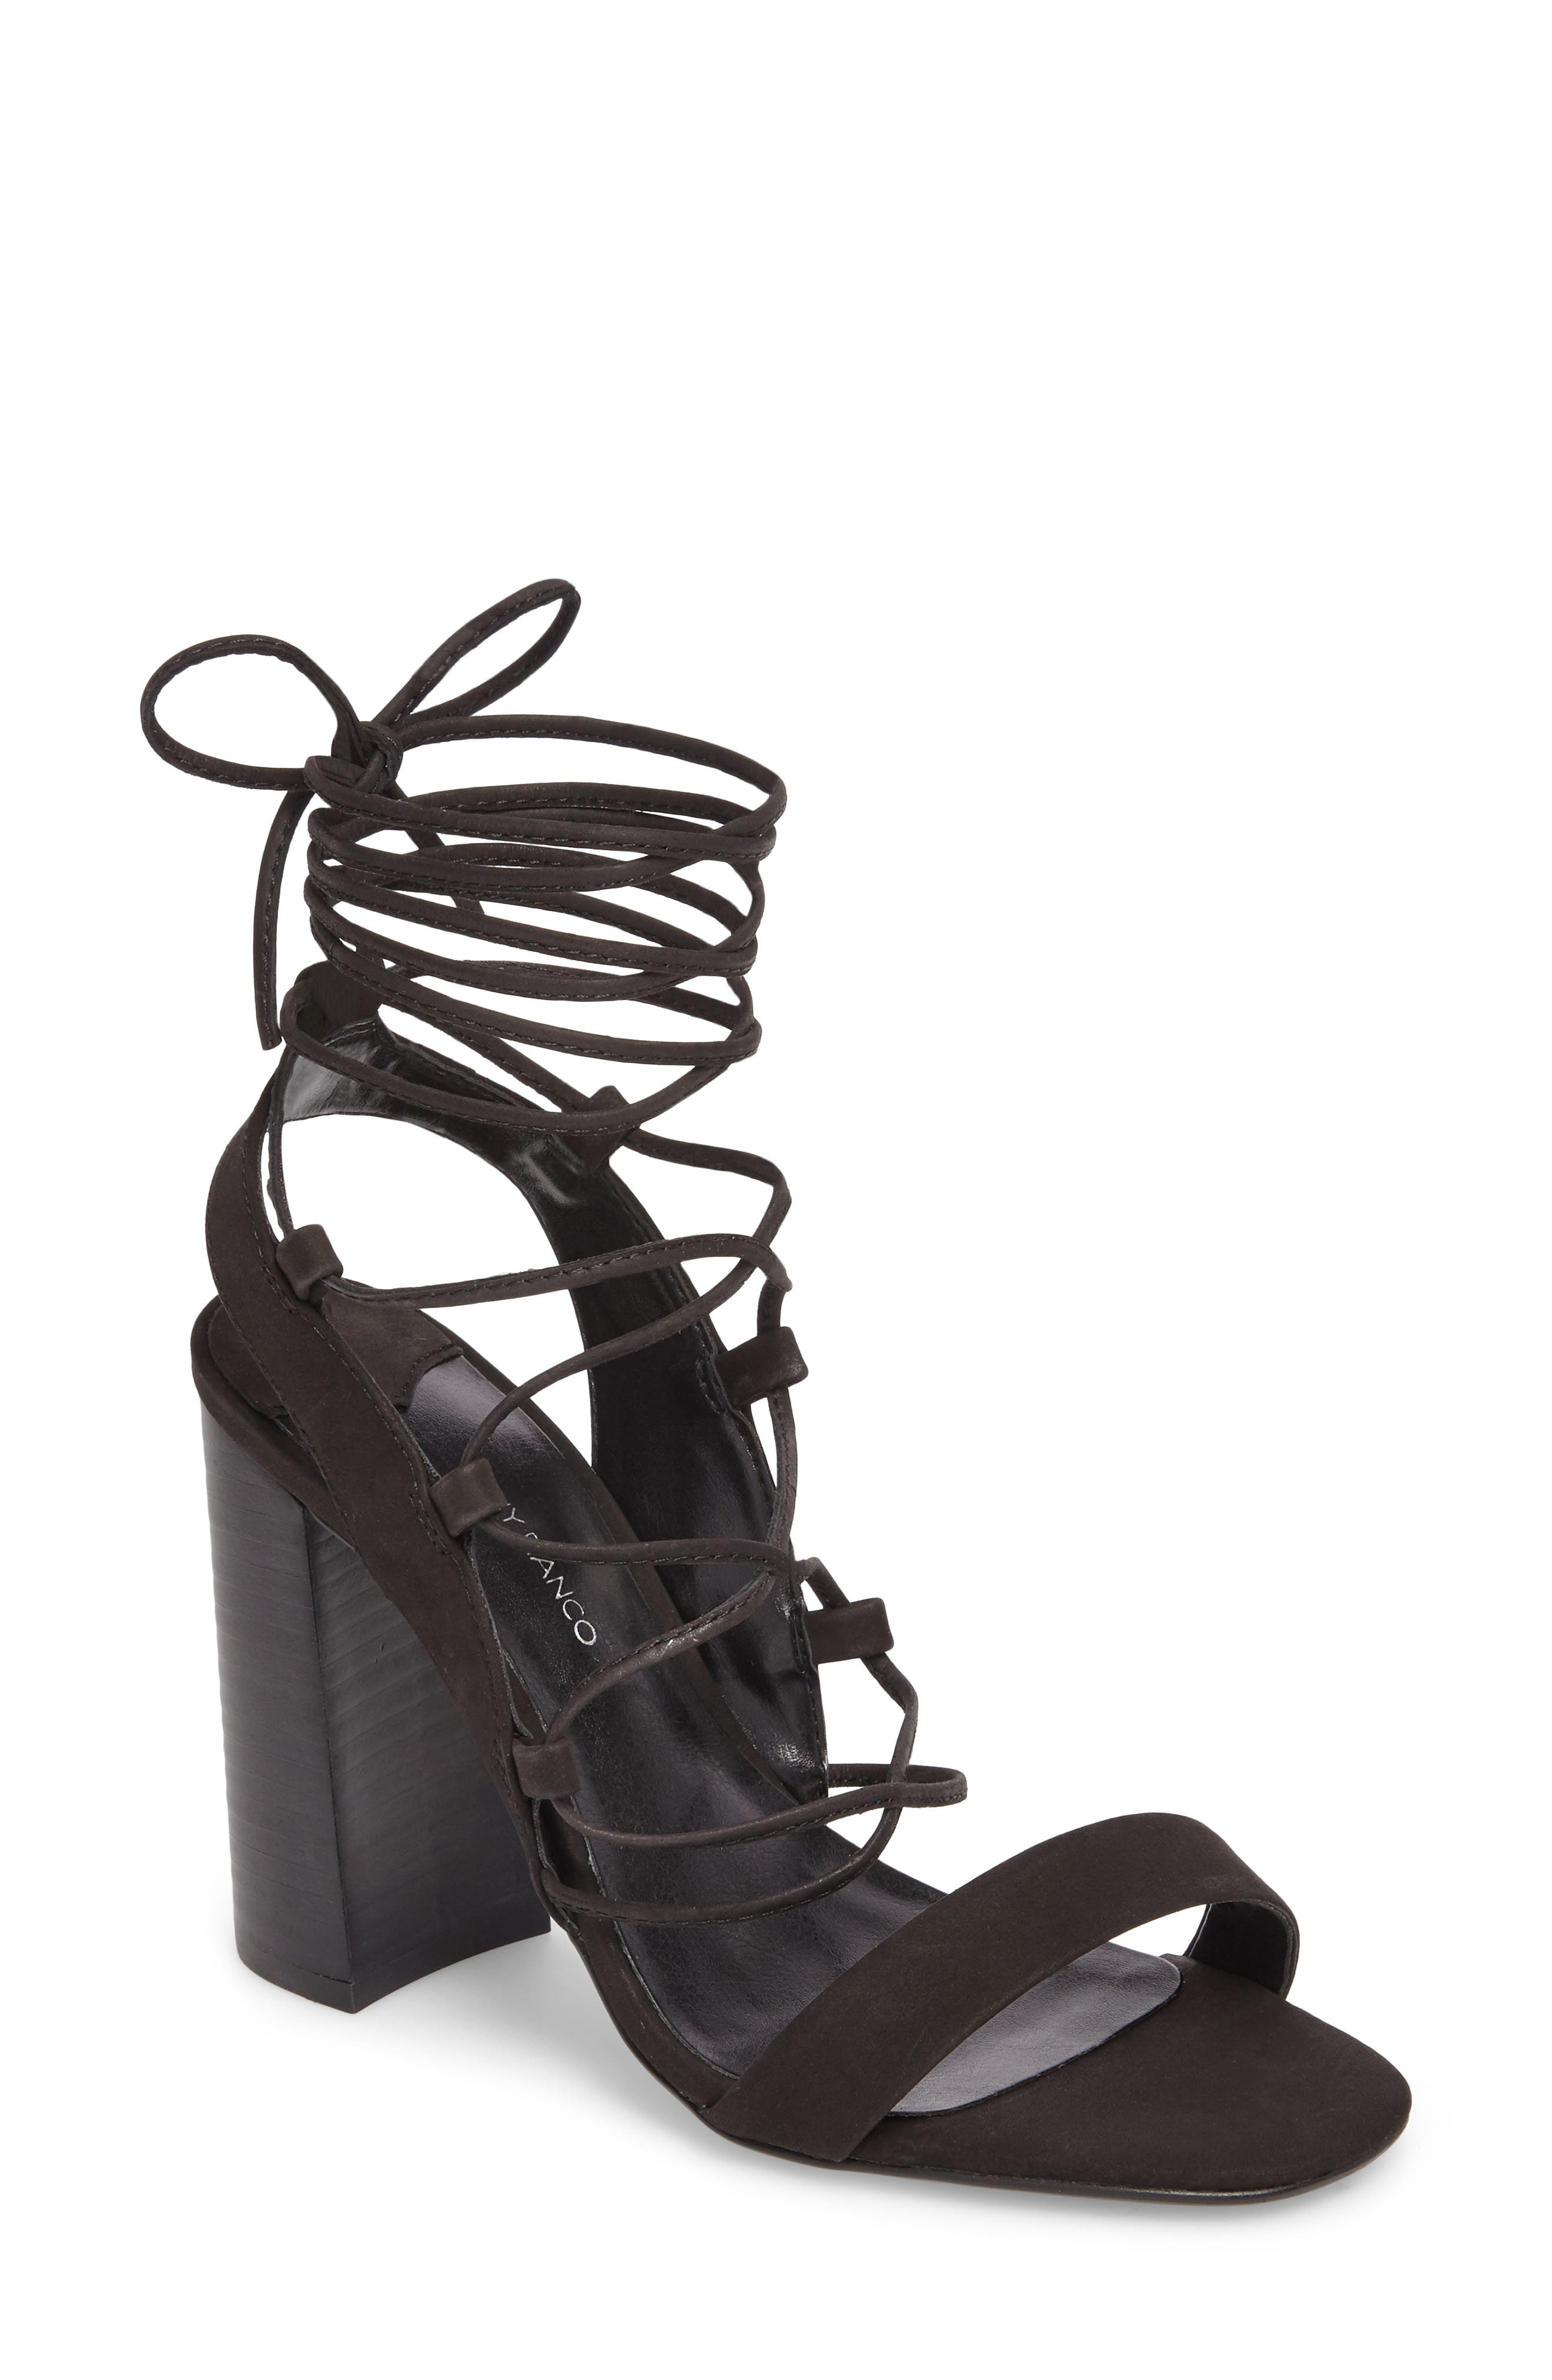 Dani Ghillie Flared Heel Sandal,                             Main thumbnail 1, color,                             Black Phoenix Nubuck Leather